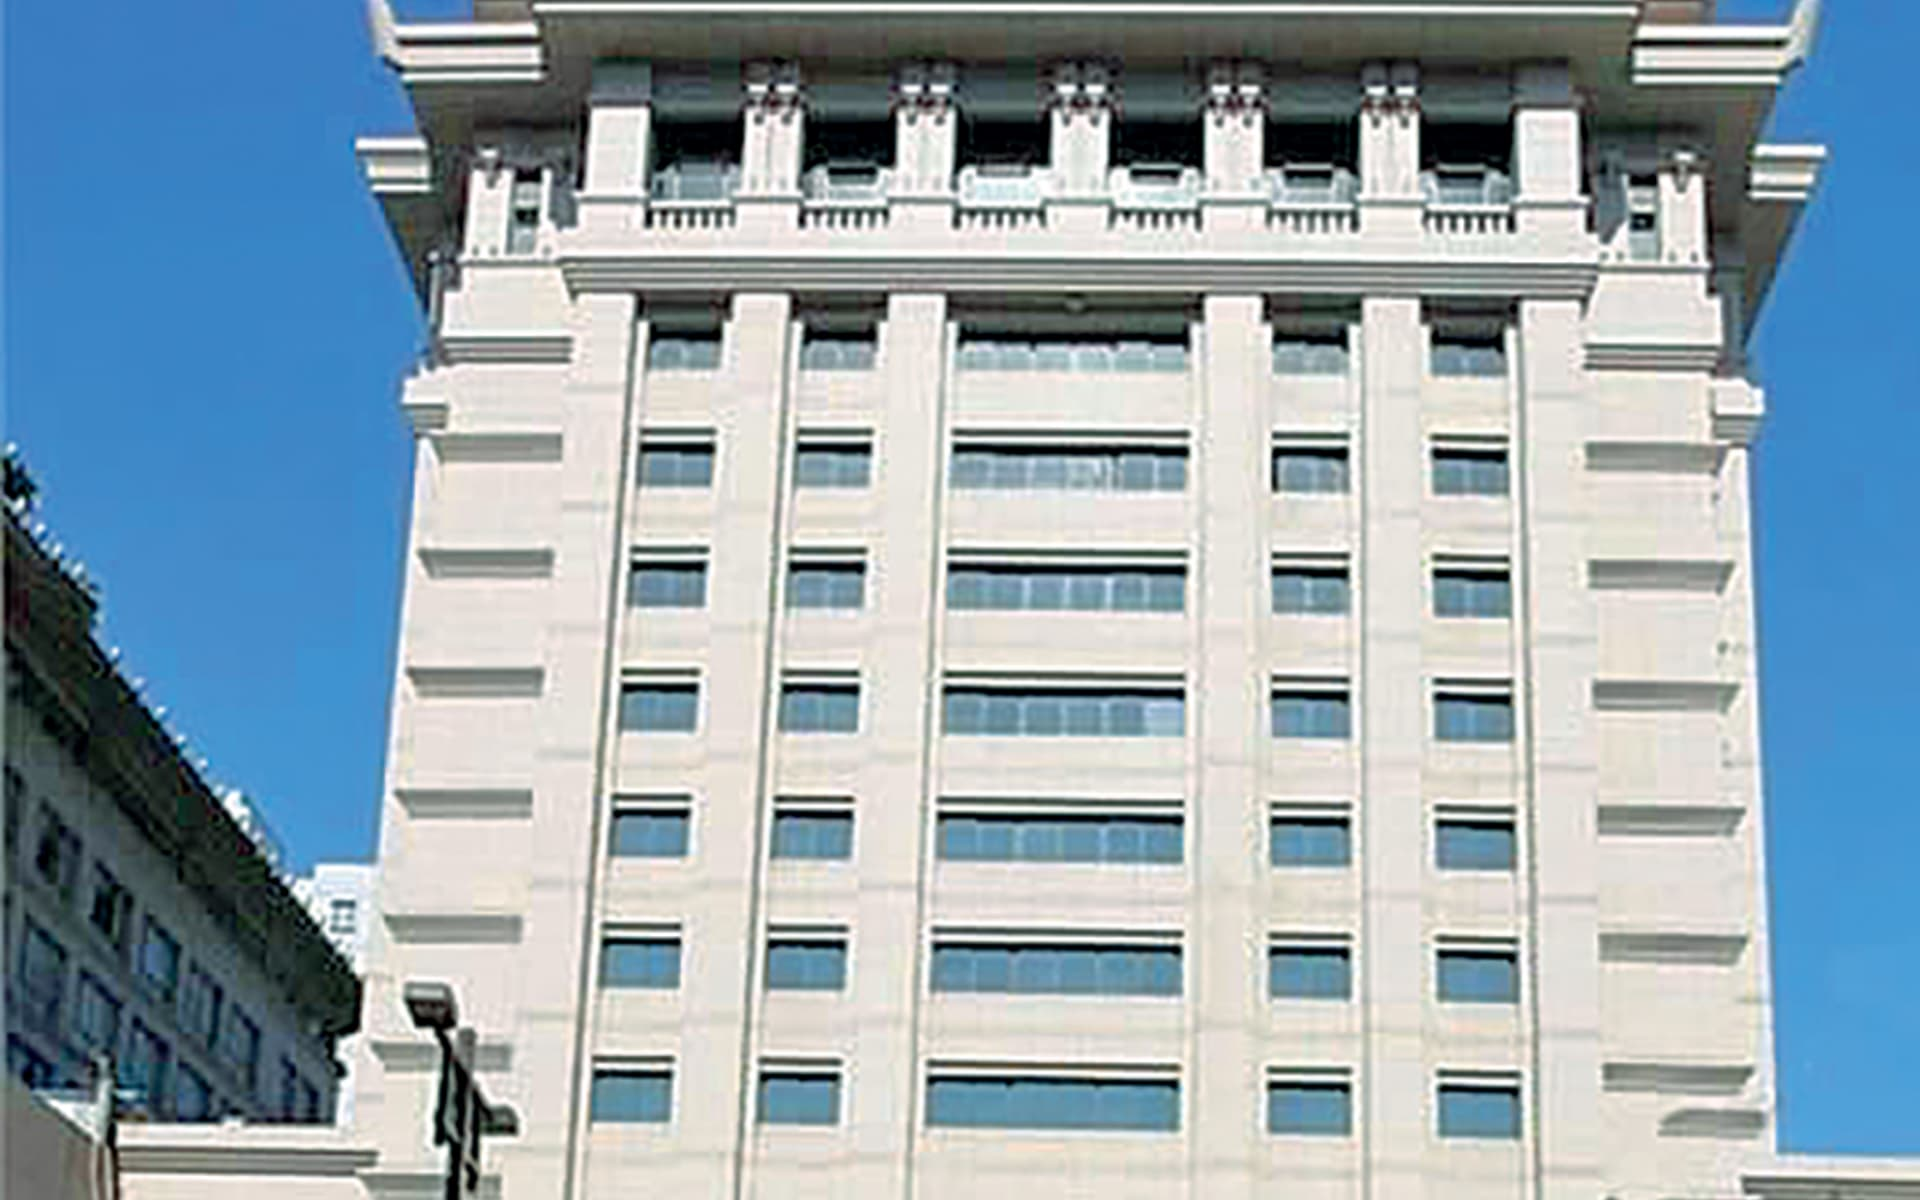 Hotel Ramada Bell Tower in Xian: Ramada-Xian-Bell-Tower-exterior